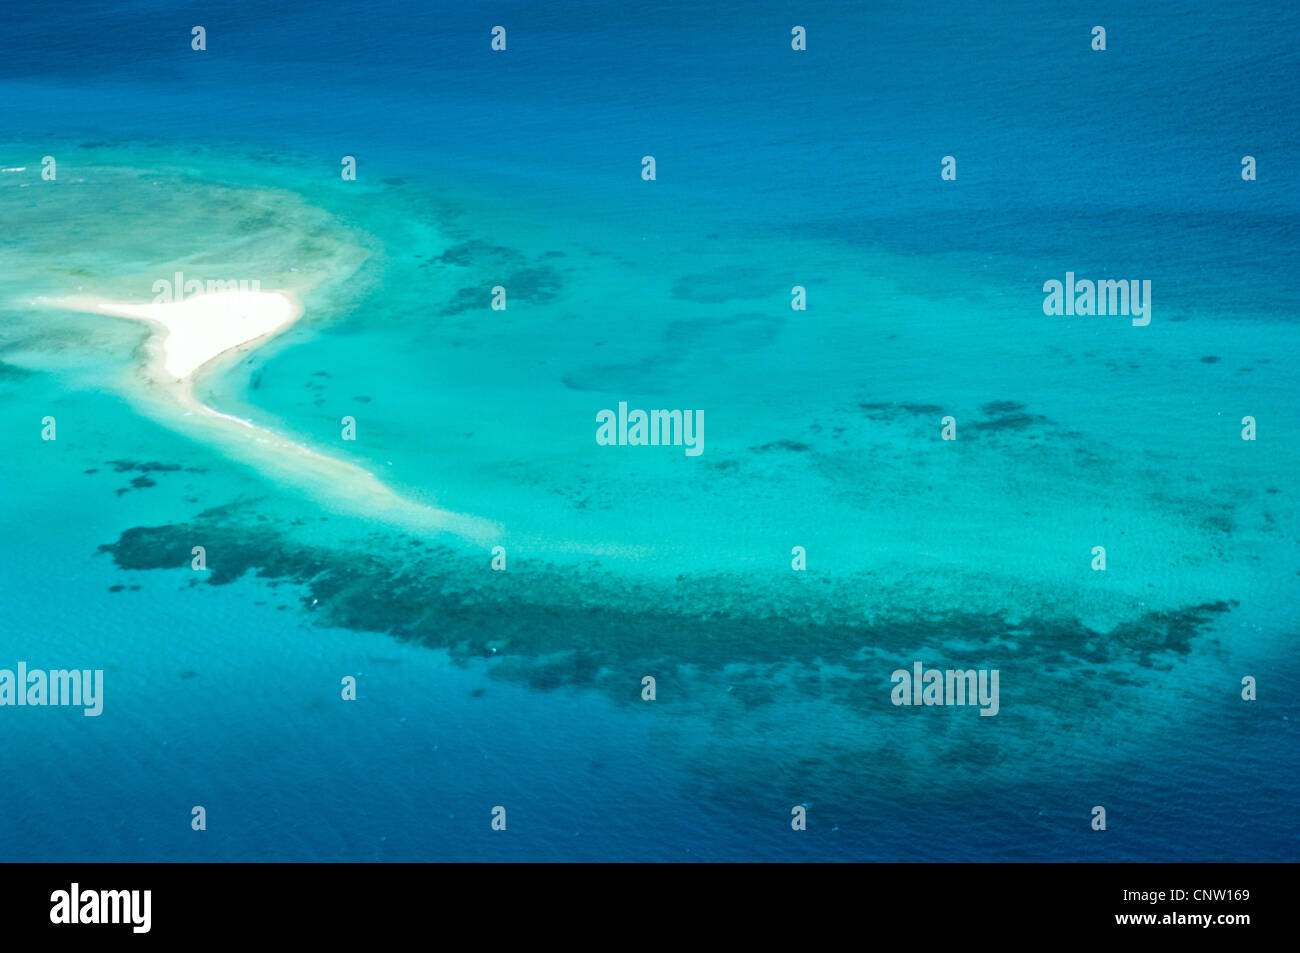 Sand banks and reefs, Mafia Channel between  Rufiji River estuary and Mafia Island, aerial view, Tanzania - Stock Image